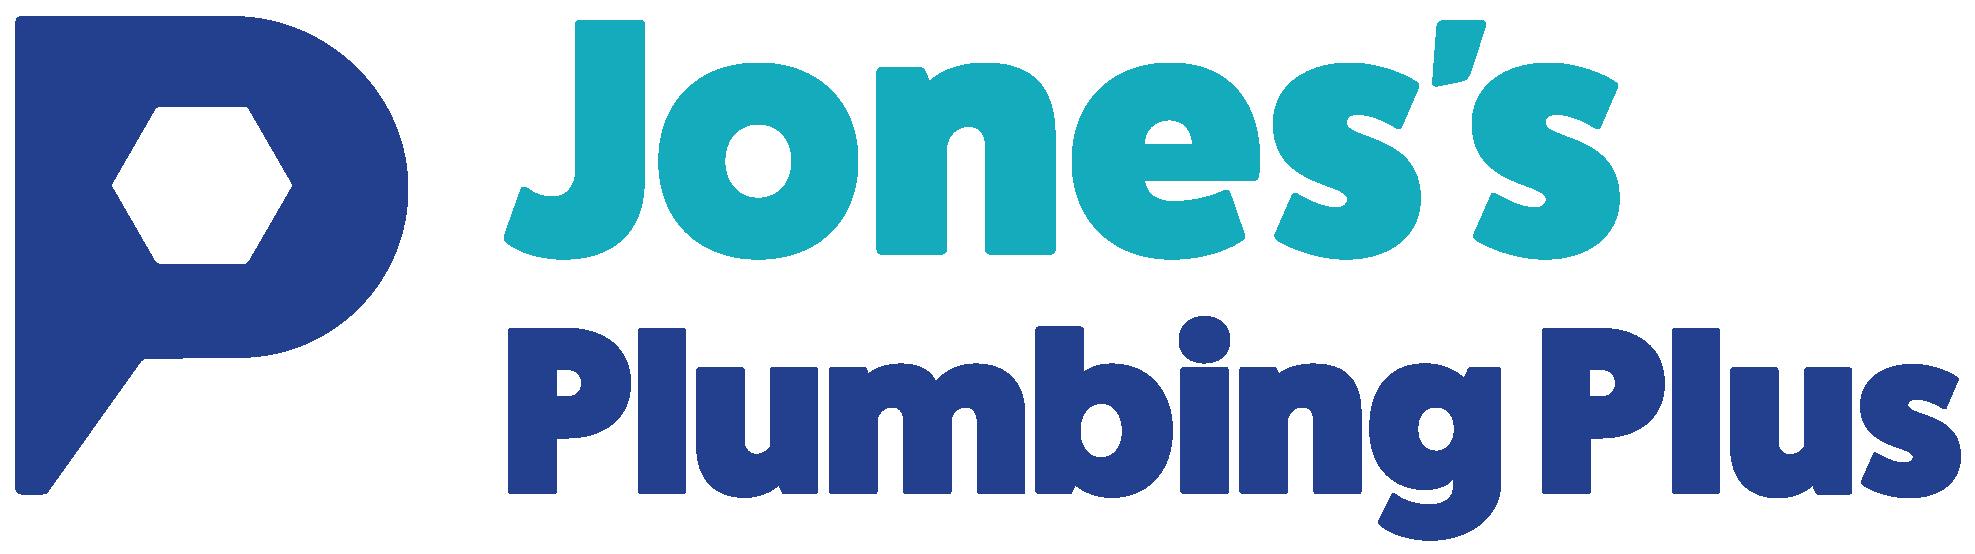 Jones Plumbing Plus Logo